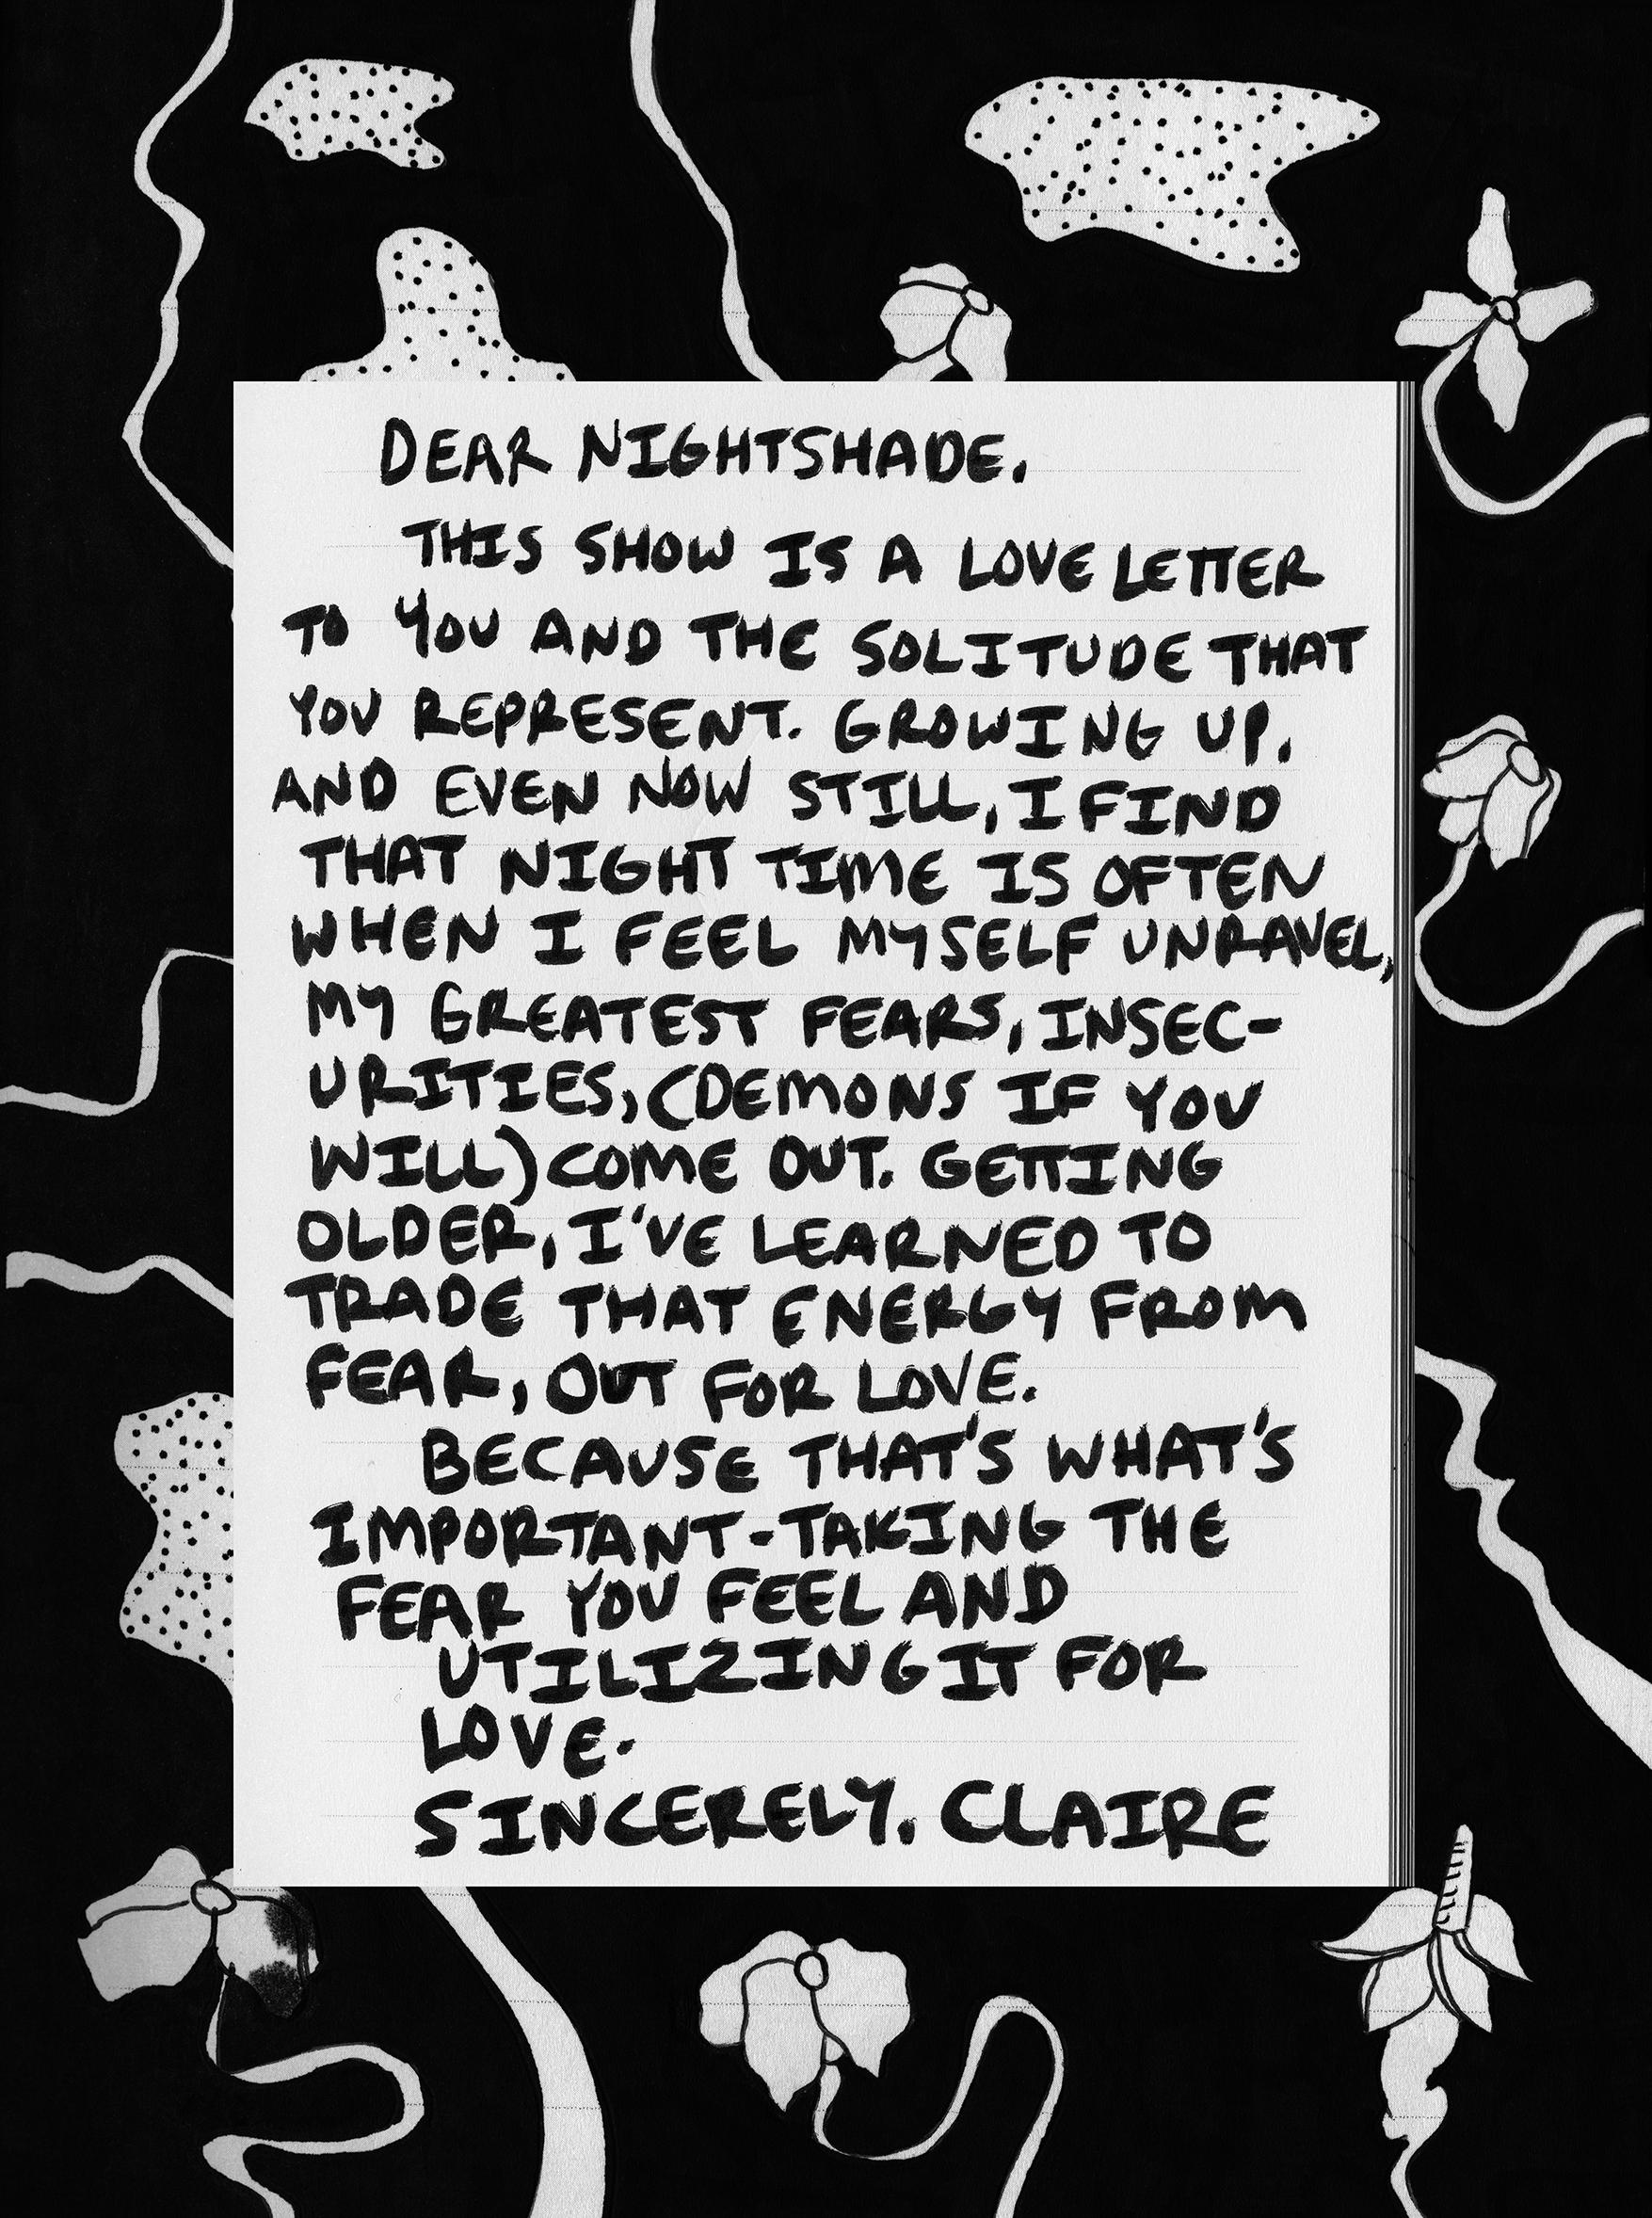 Night Shade Press Letter